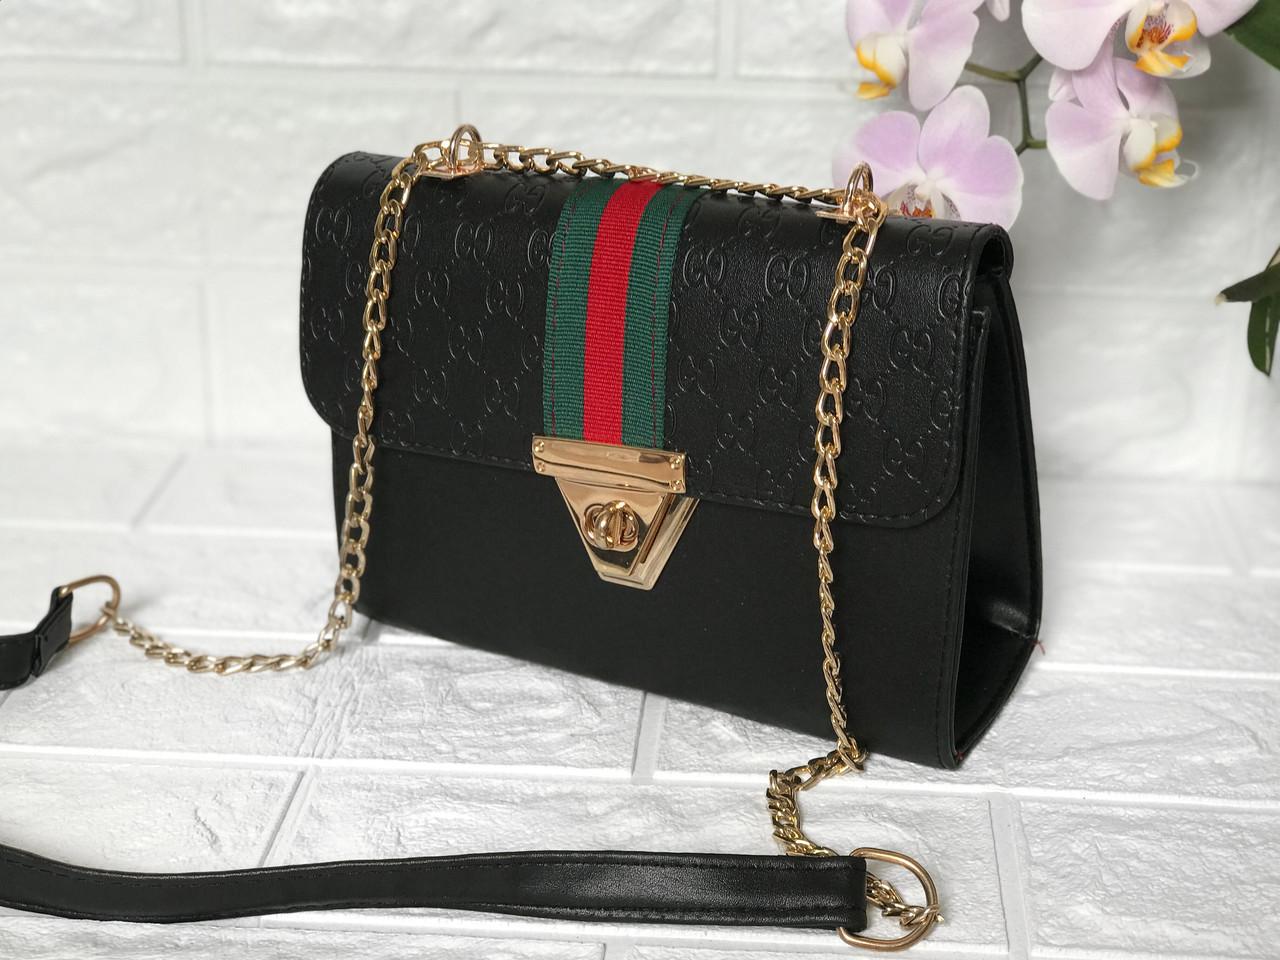 Клатч  Gucci сумка (гуччи копия ) чёрная